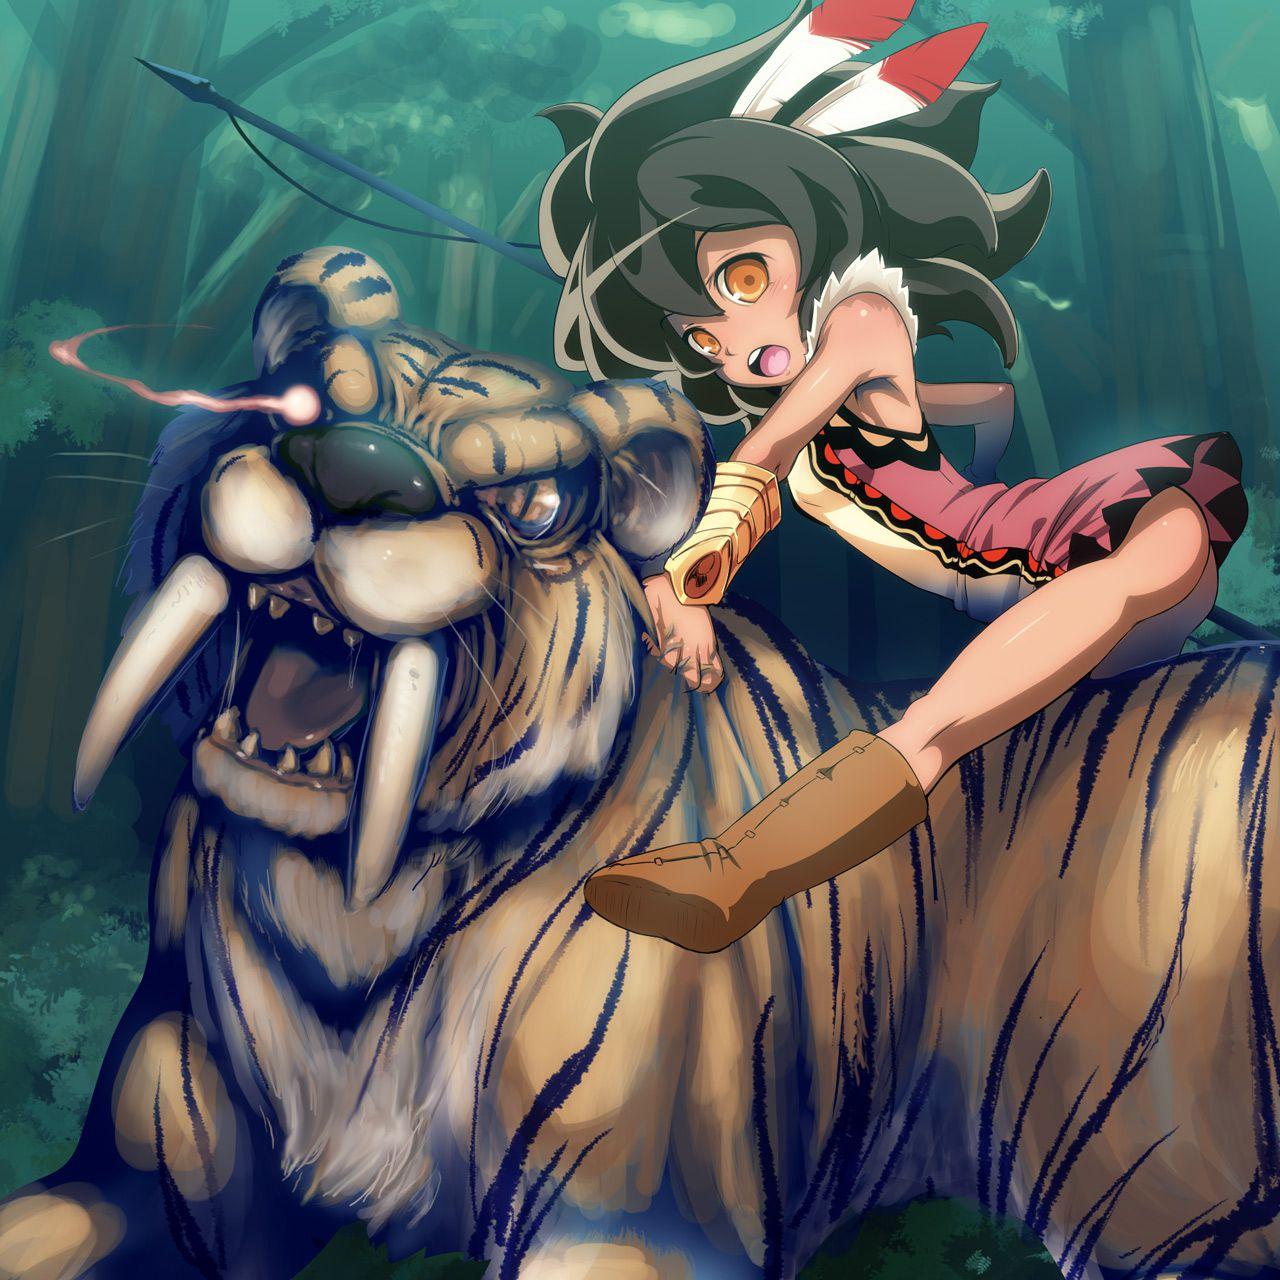 beast_king_(sekaiju)000